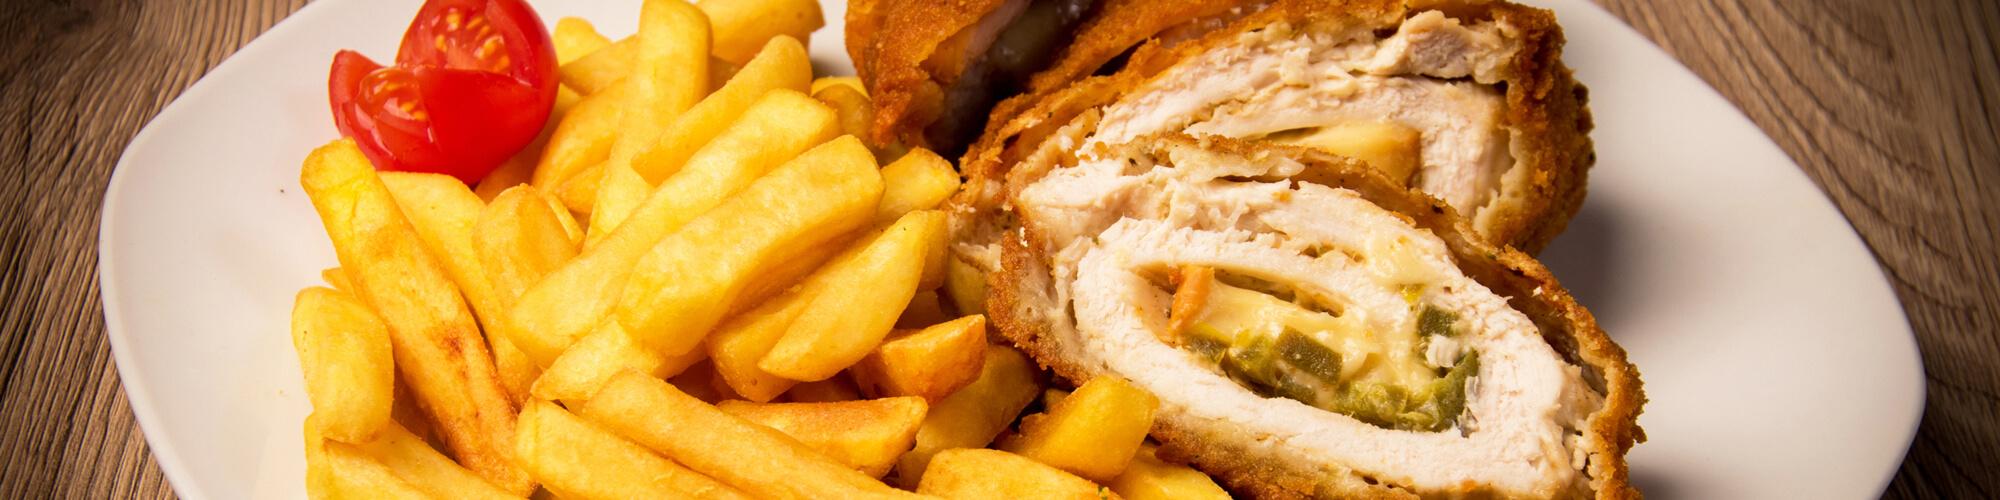 b0b4d4664a Before Bar Debrecen - Burger, wrap, saláta rendelés és ...